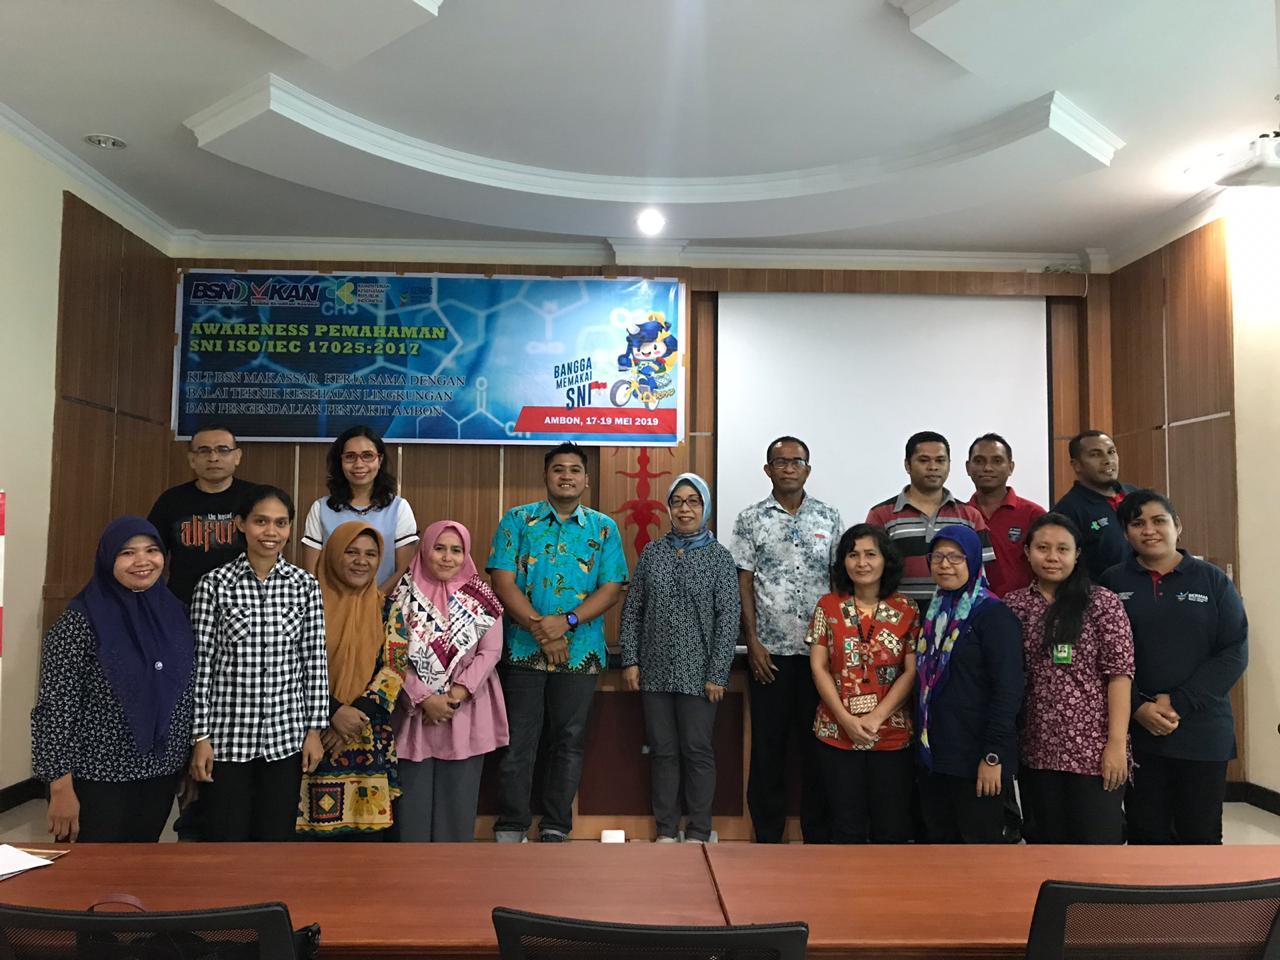 Awareness SNI ISO/IEC 17025:2017 KLT-BSN Makassar Kerja sama BTKLPP Kelas II Ambon